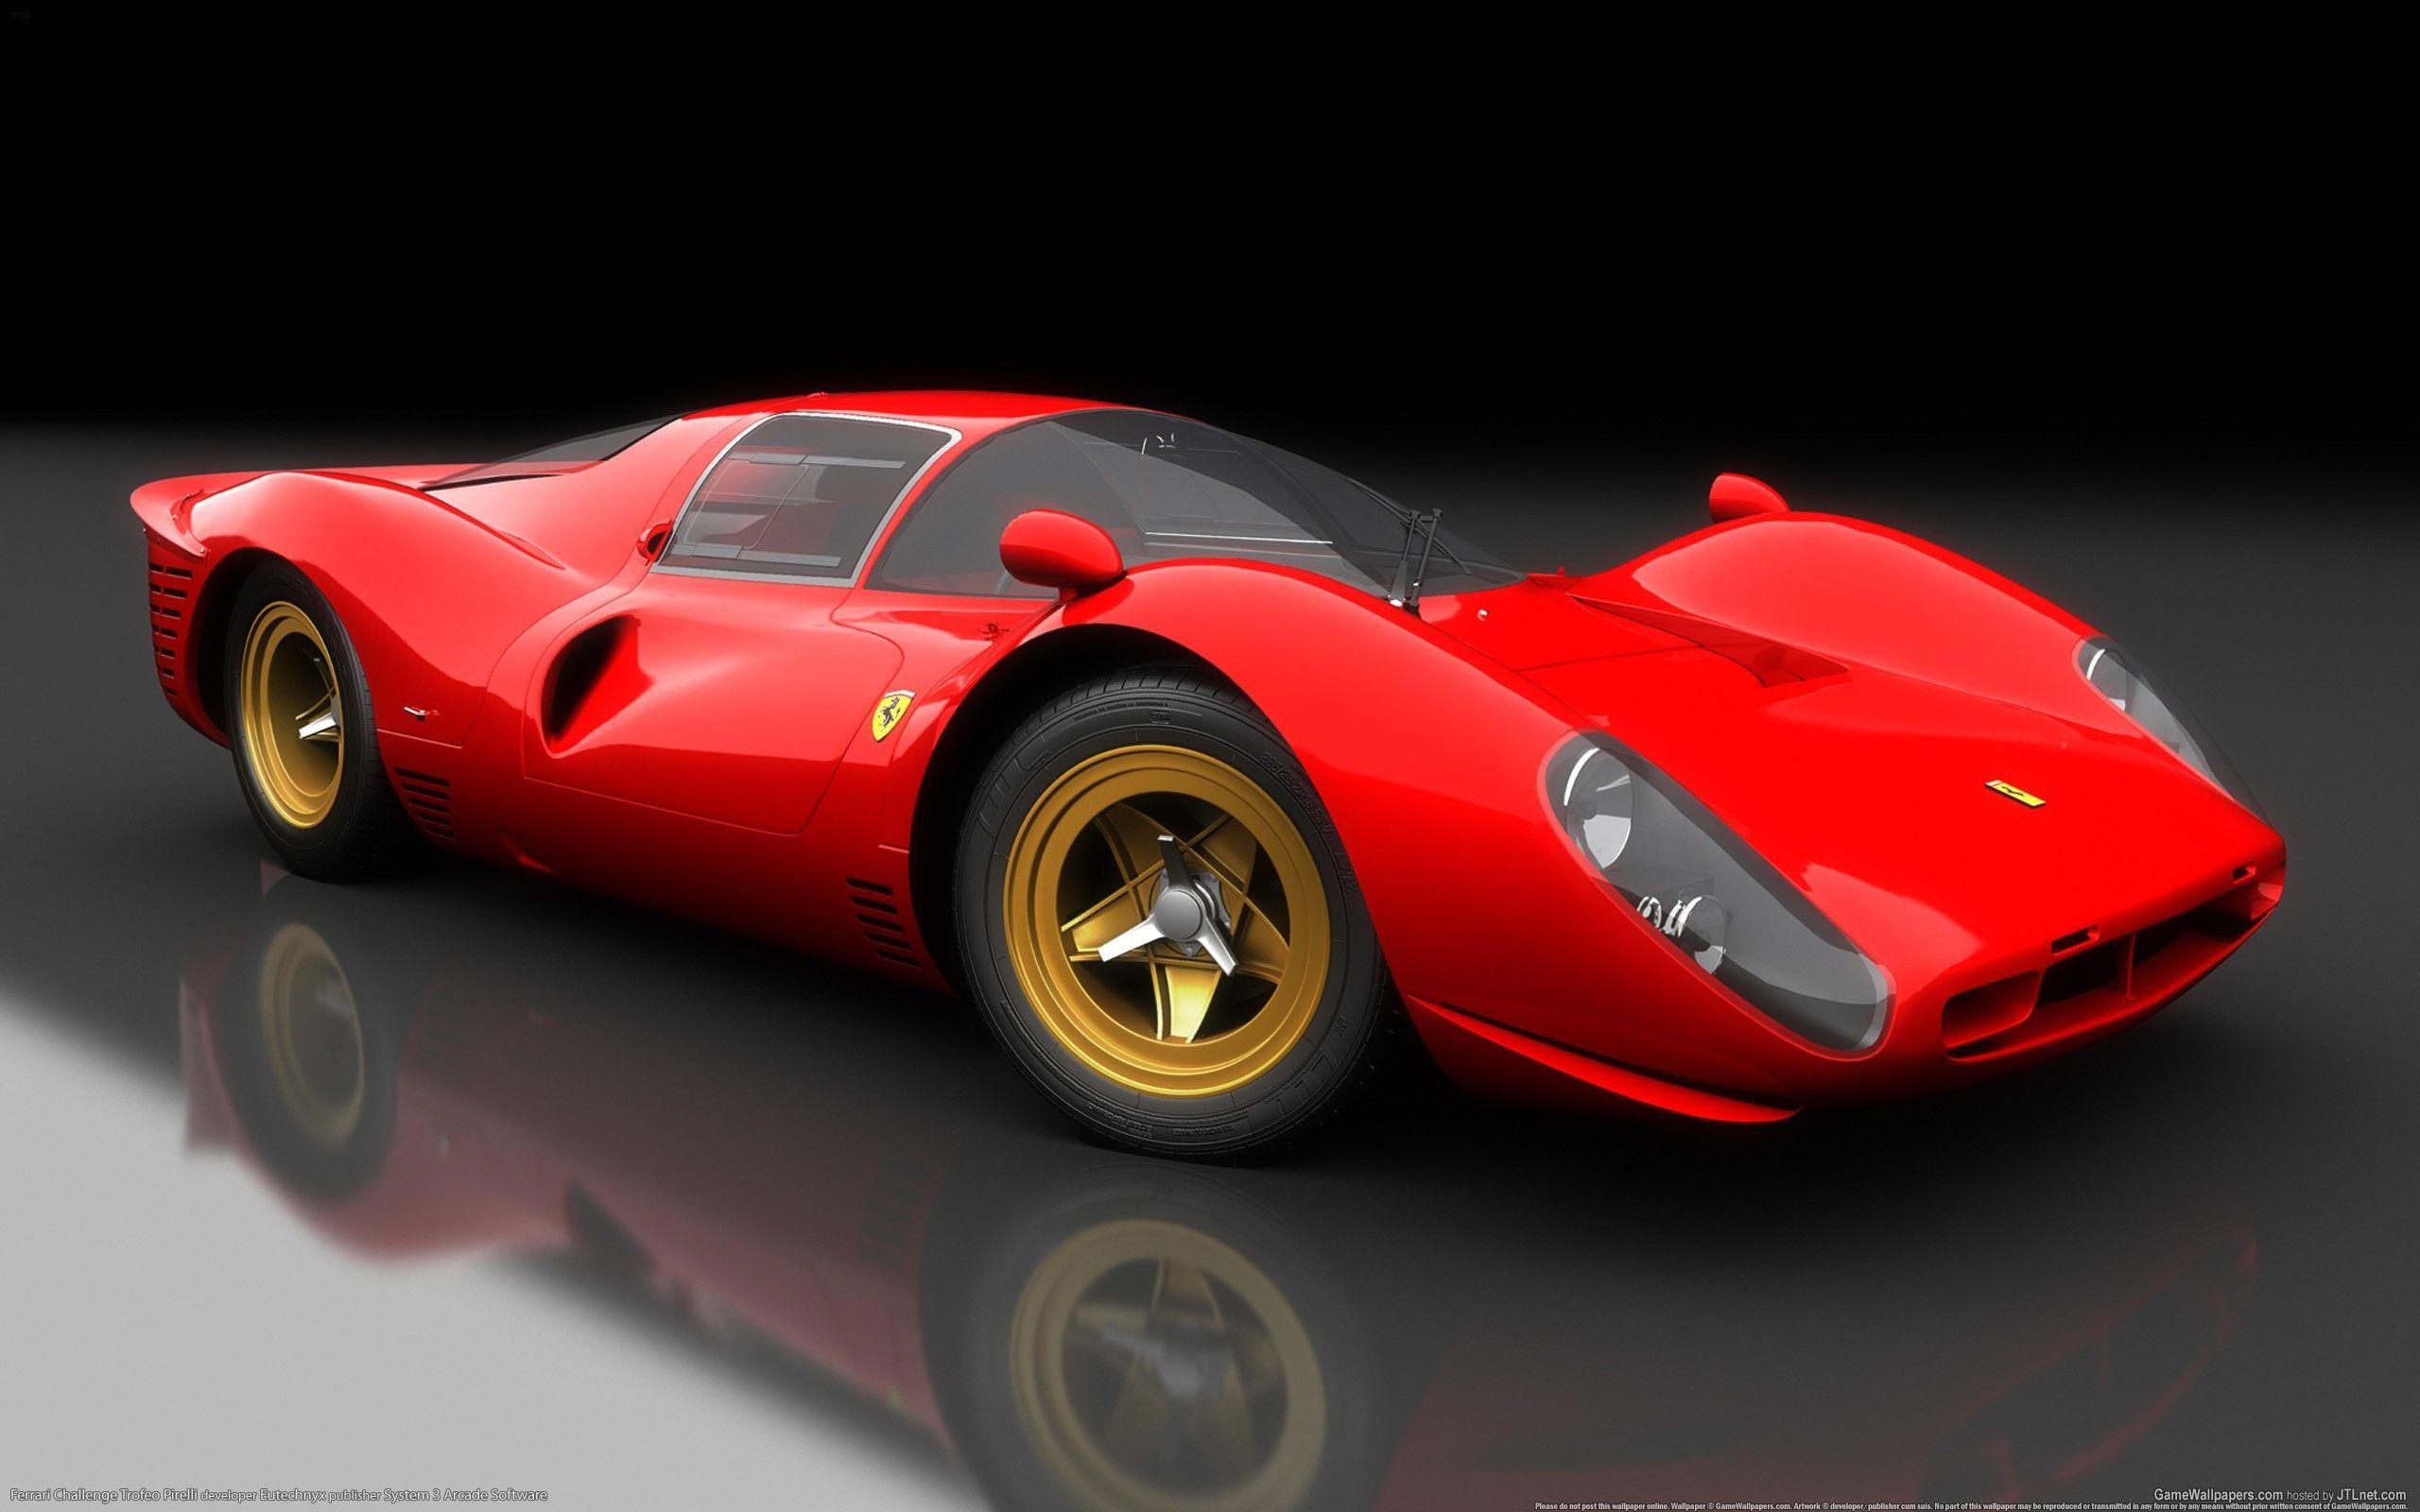 4k Ferrari Wallpapers Hd Desktop Backgrounds Trumpwallpapers